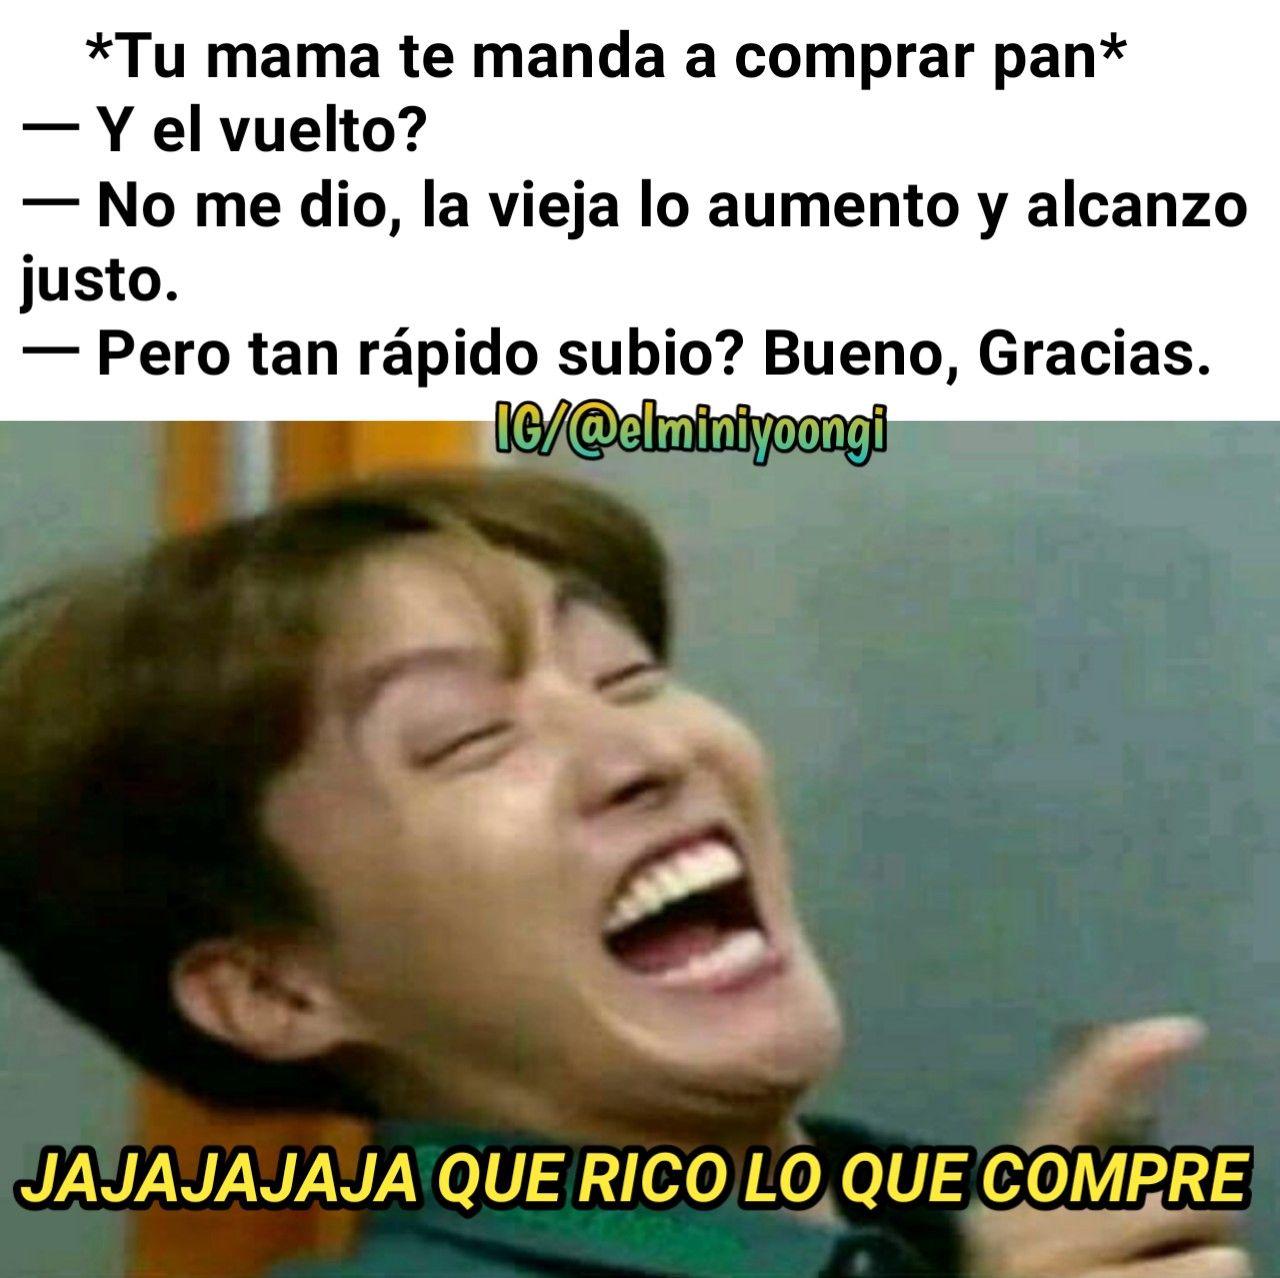 Memes De Bts Espanol 2018 En Instagram Elminiyoongi Memes Bts Espanol Memes Memes En Espanol